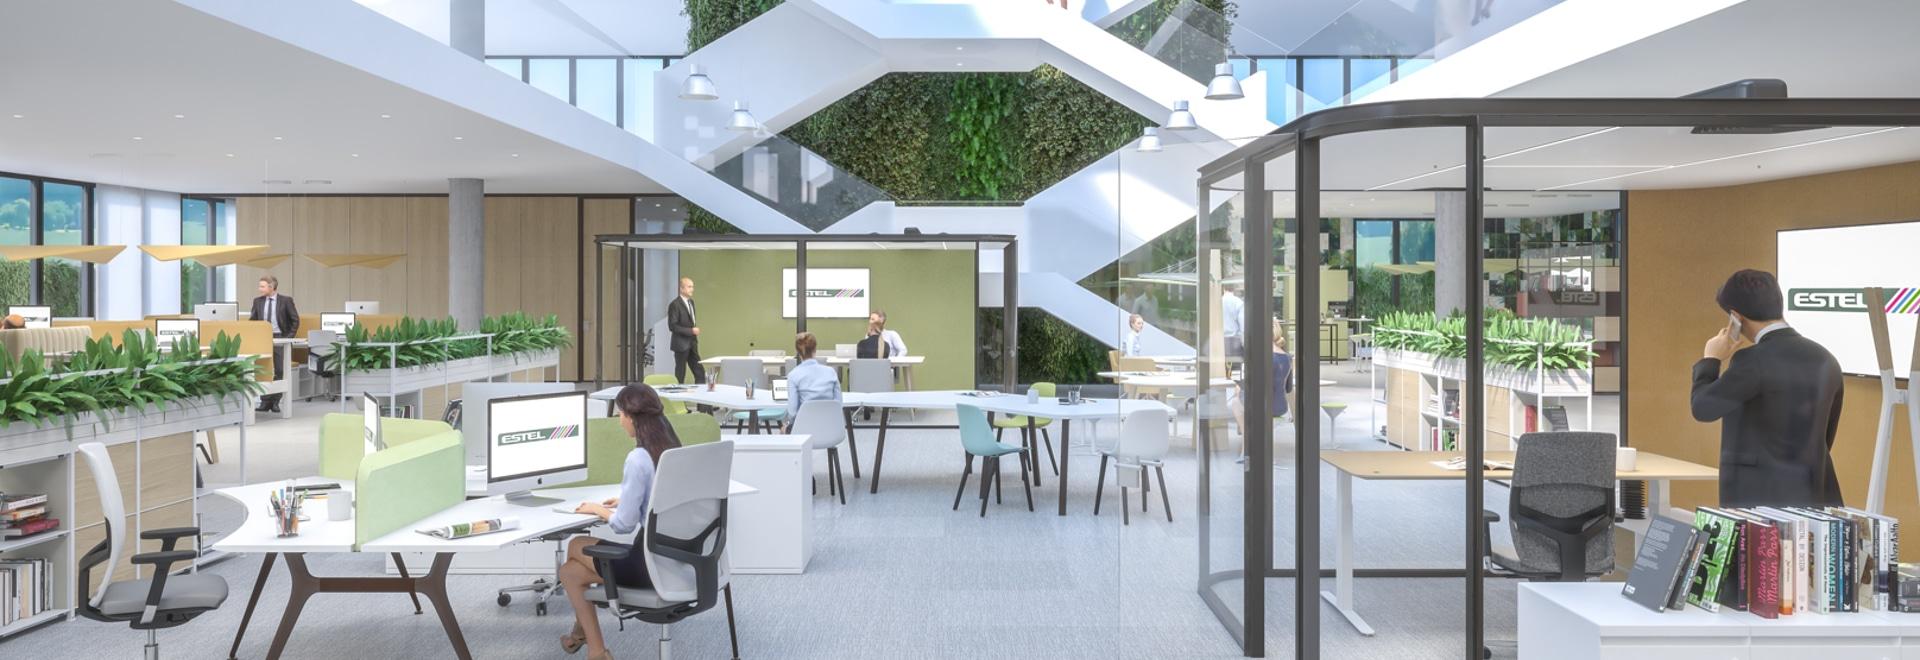 Italian Smart Office Environment